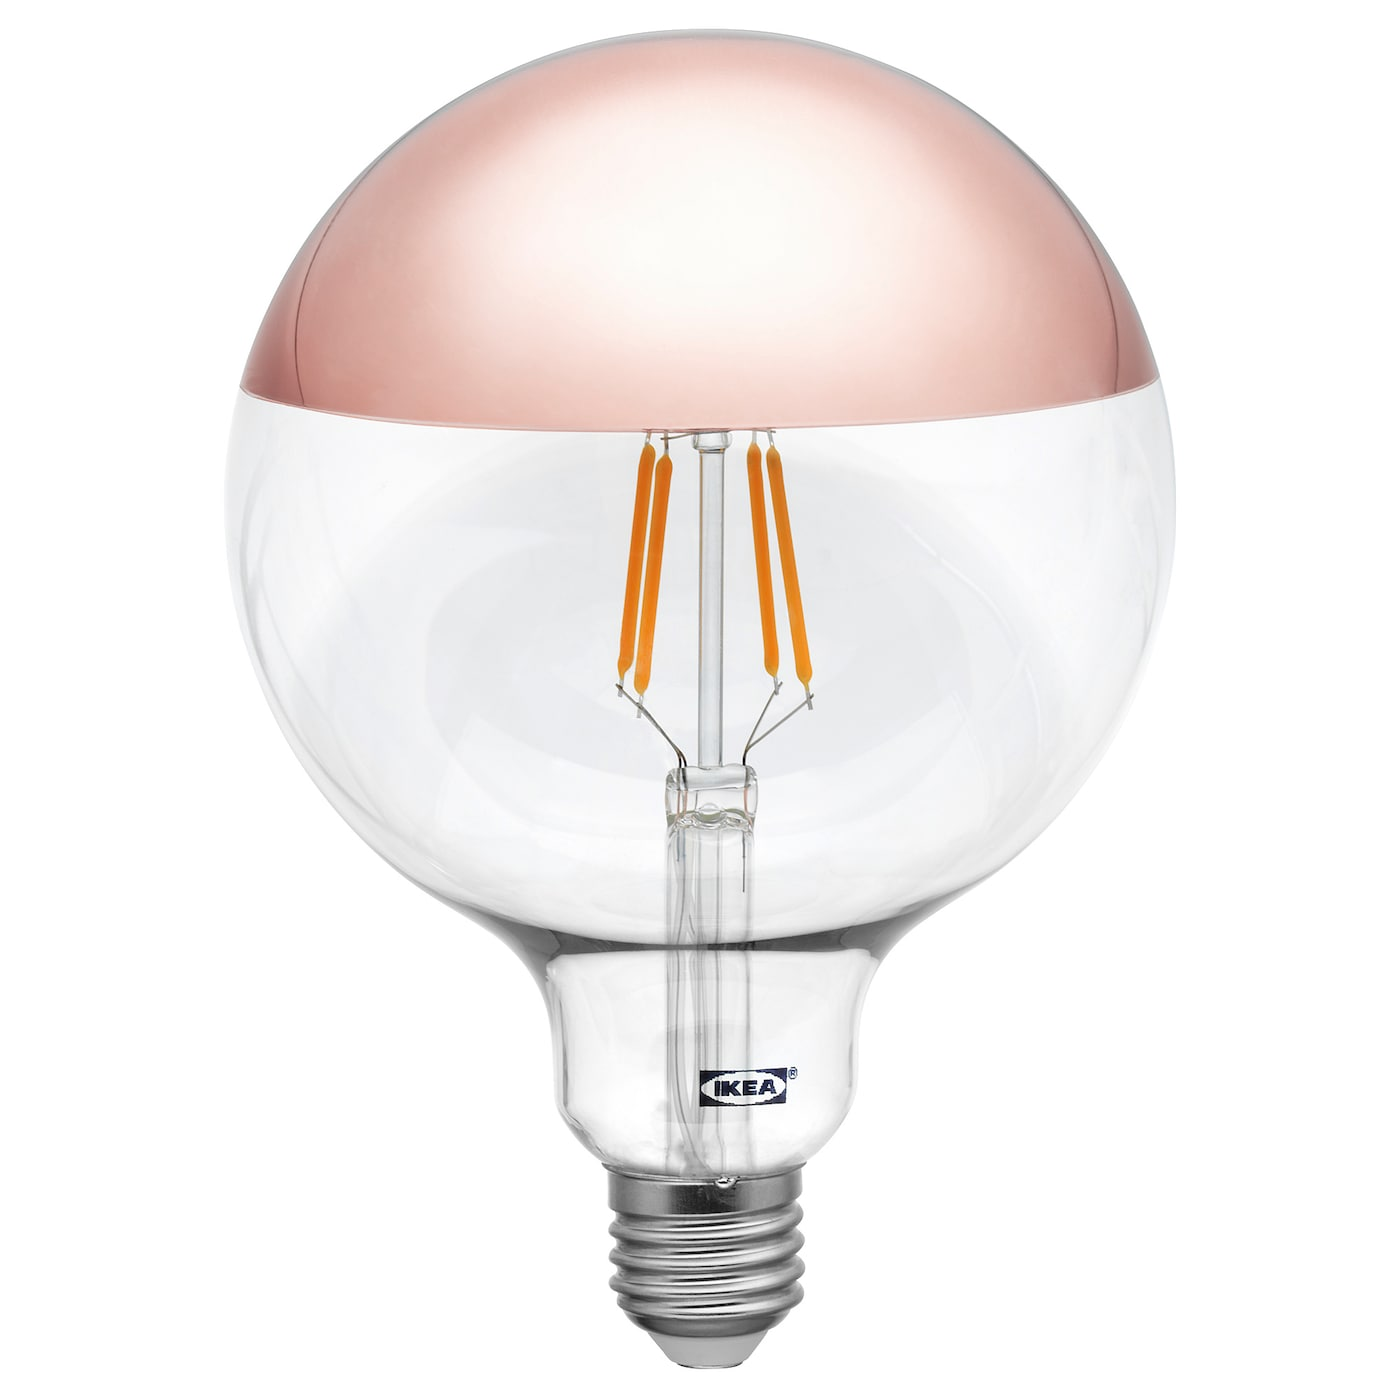 Sillbo bombilla led e27 370lm globo rosa dorado efecto espejo 125 mm ikea - Espejo con bombillas ikea ...